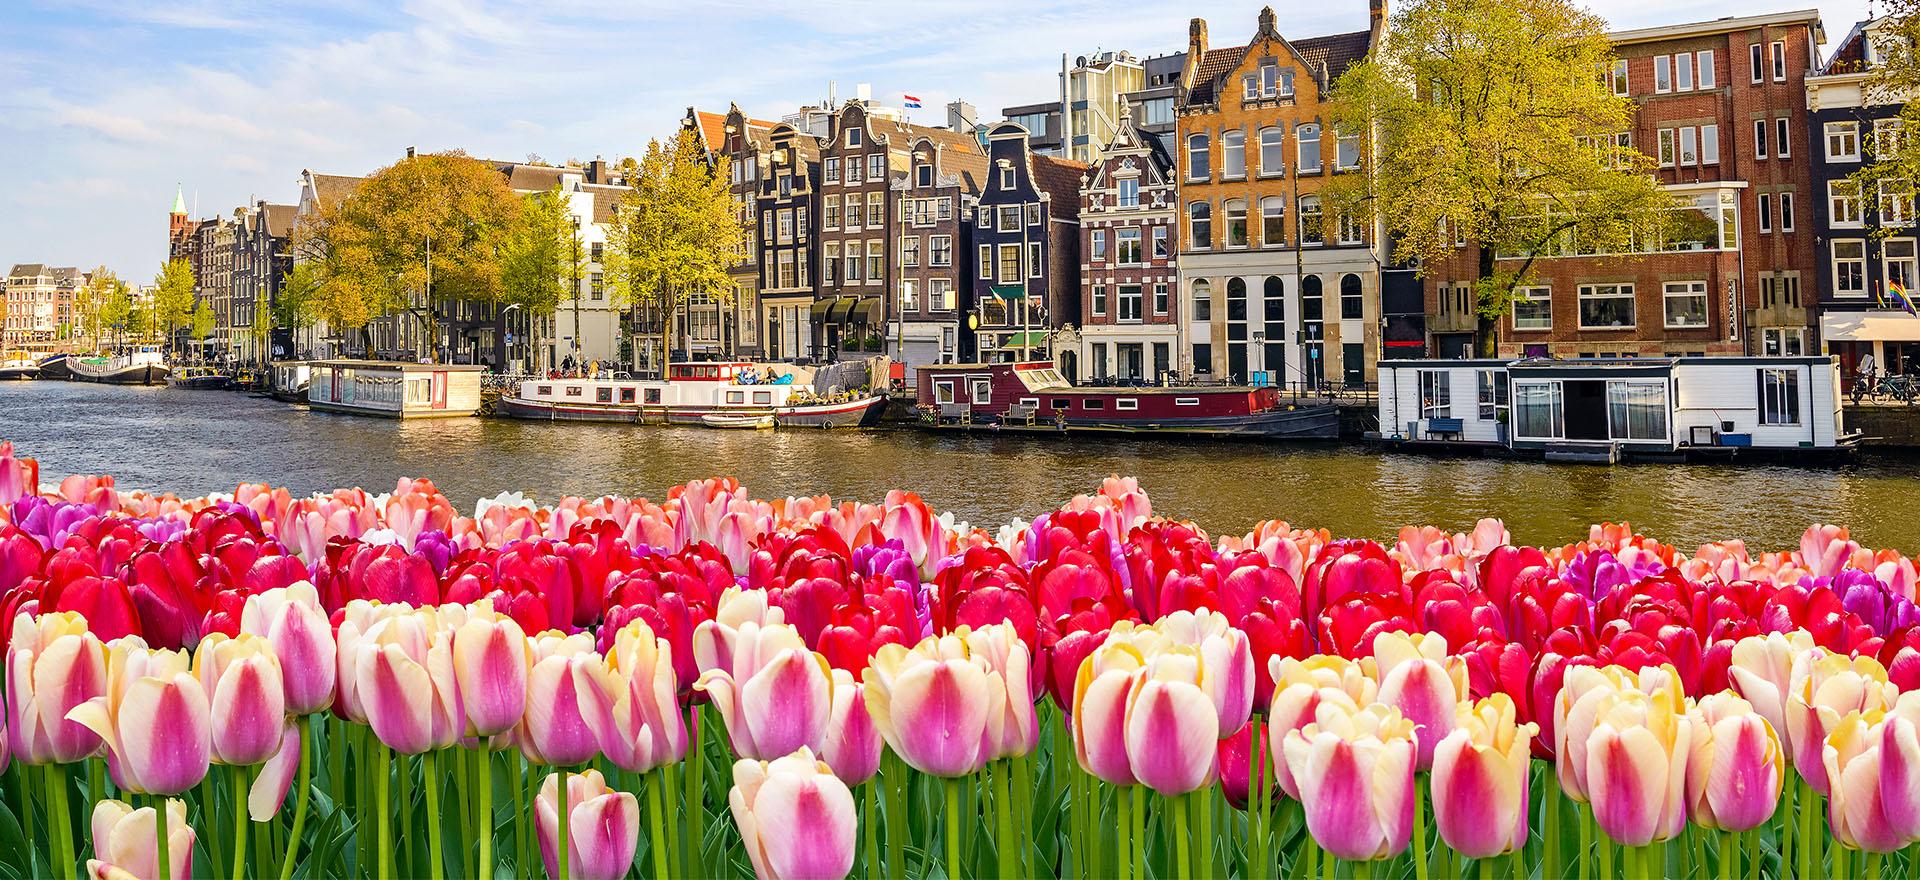 Dutch Waterways with Tulips